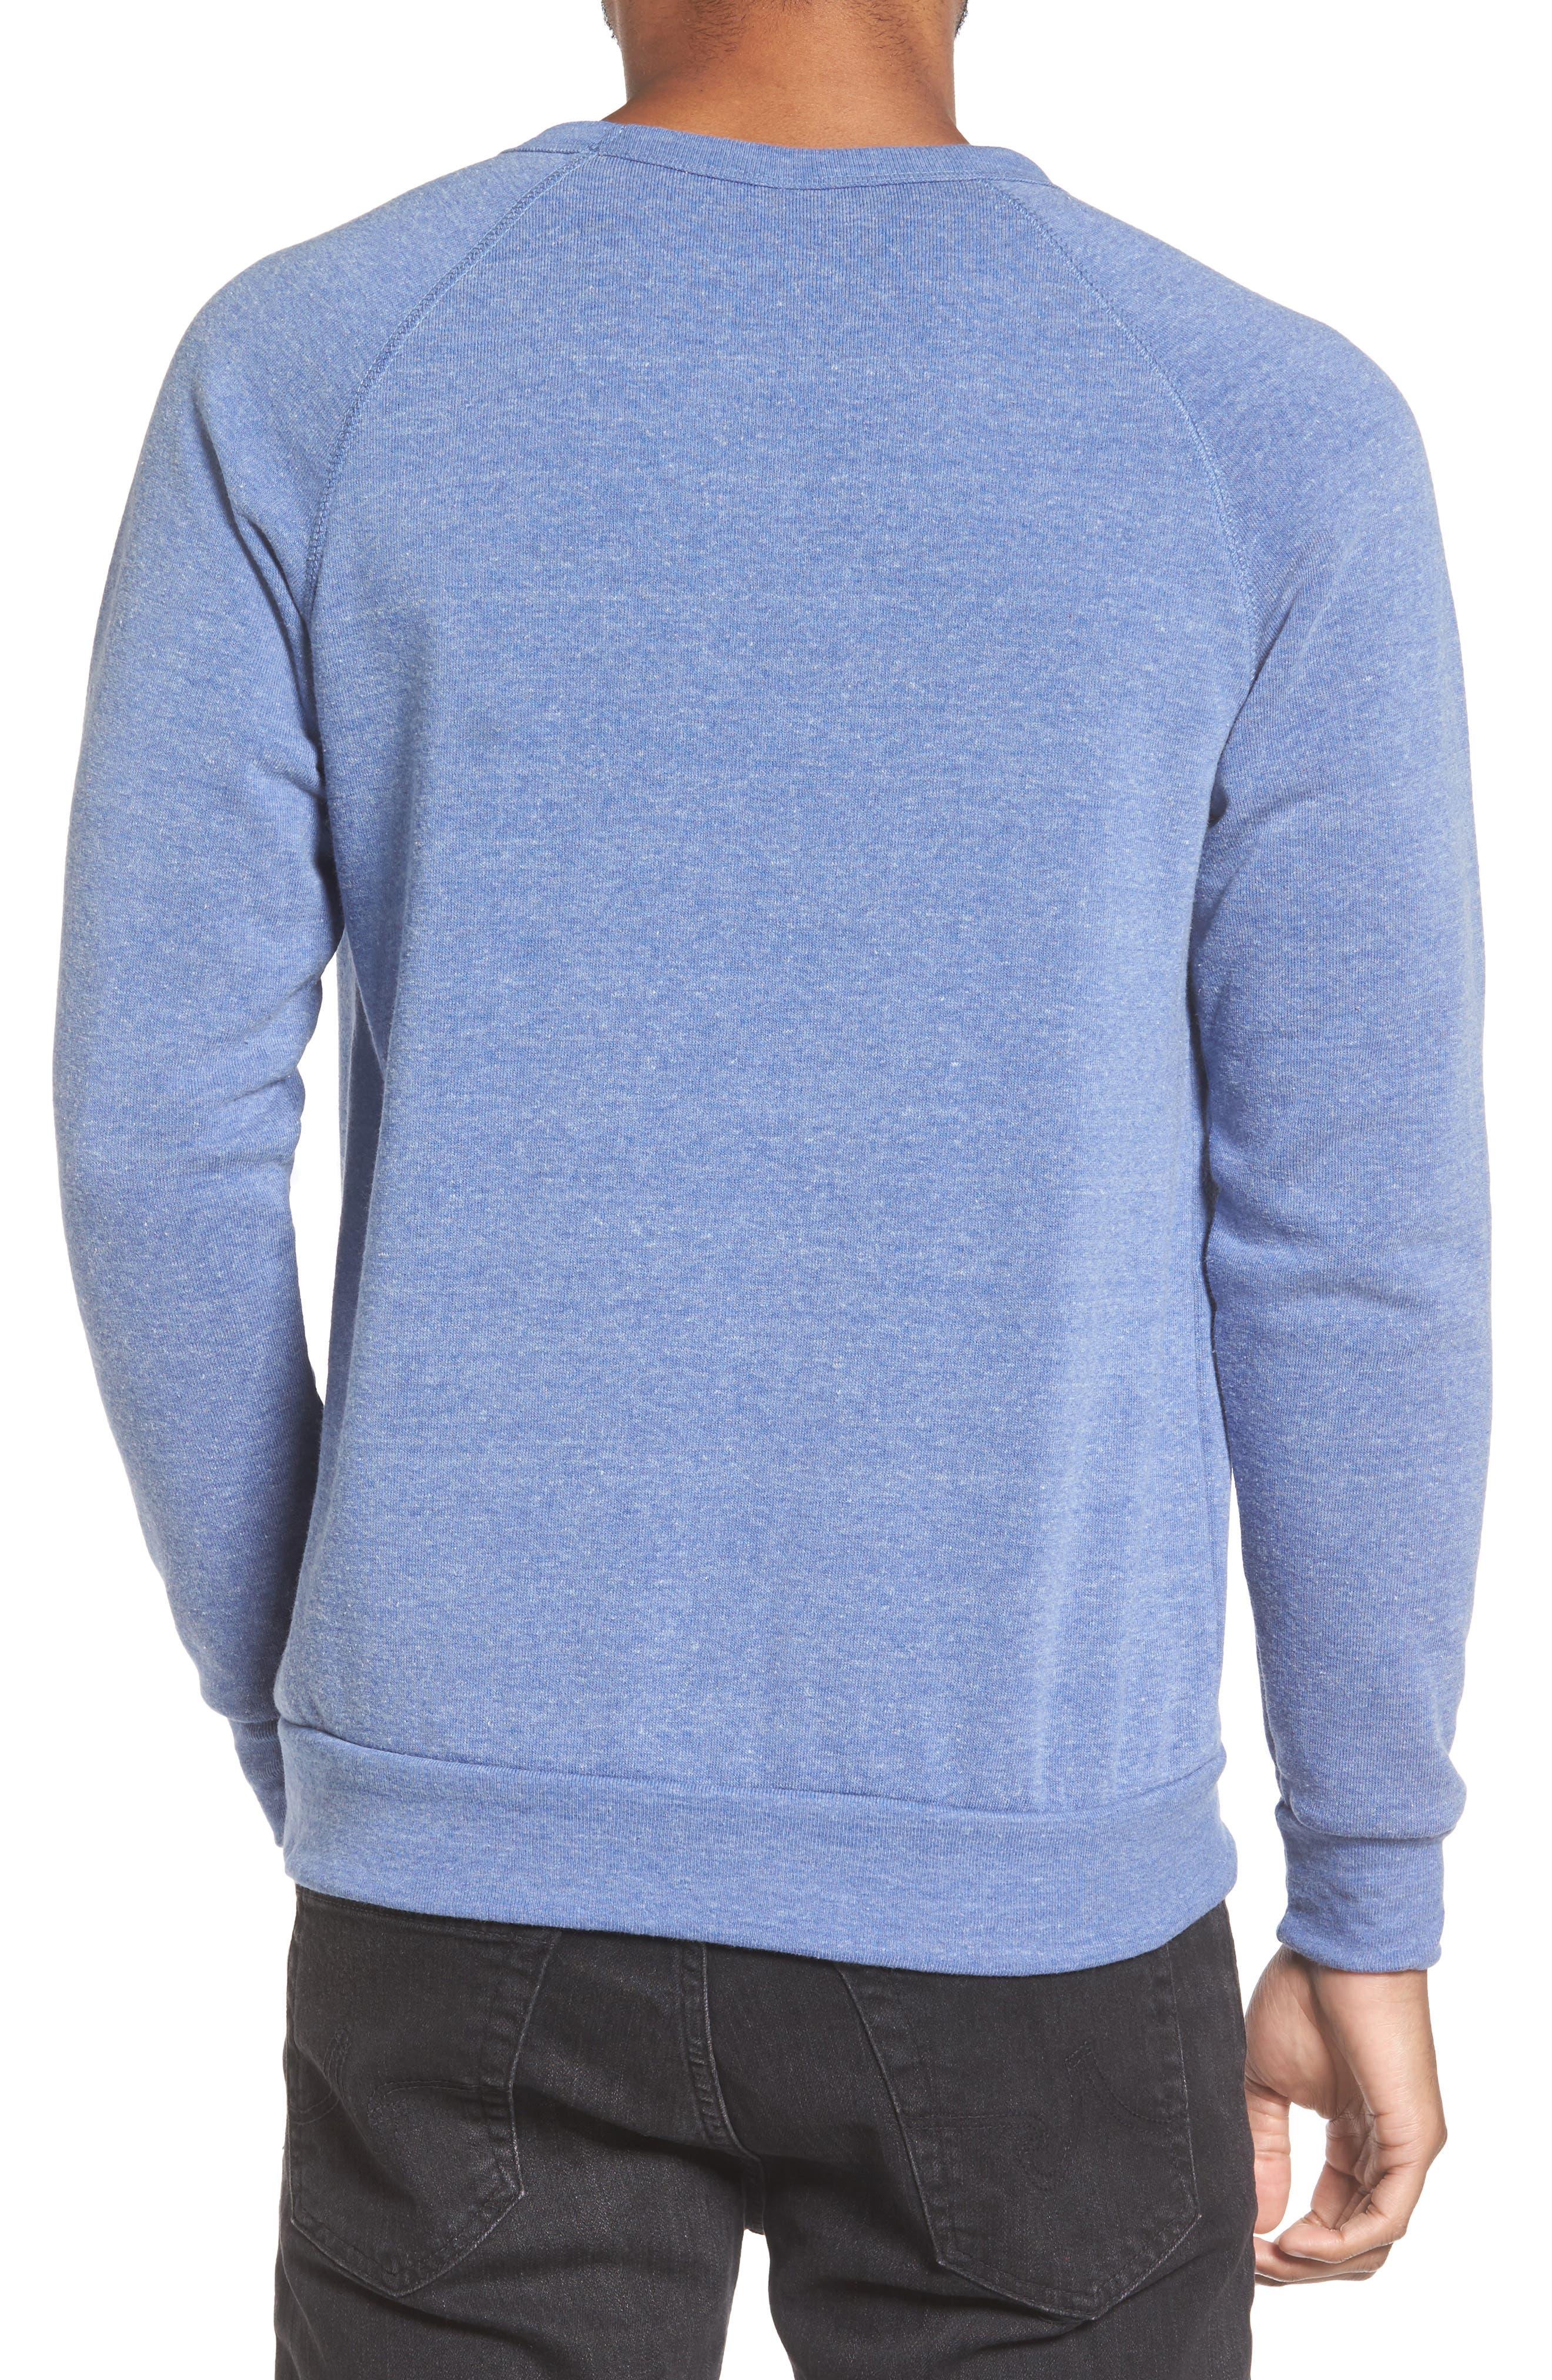 'The Champ' Sweatshirt,                             Alternate thumbnail 21, color,